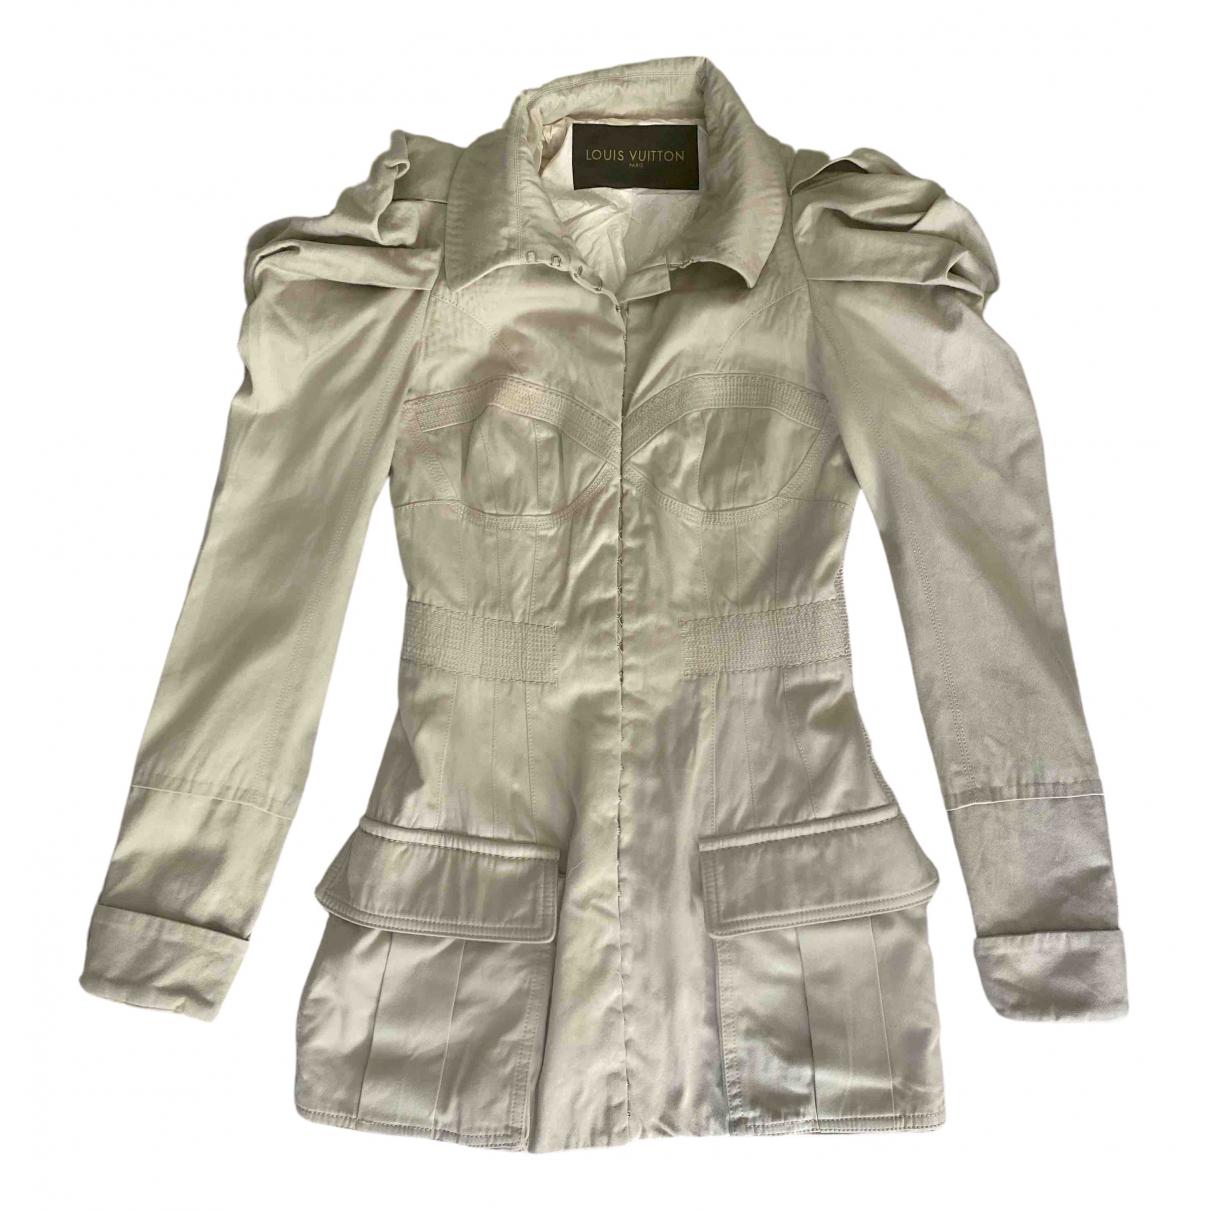 Louis Vuitton \N Kleid in  Beige Denim - Jeans